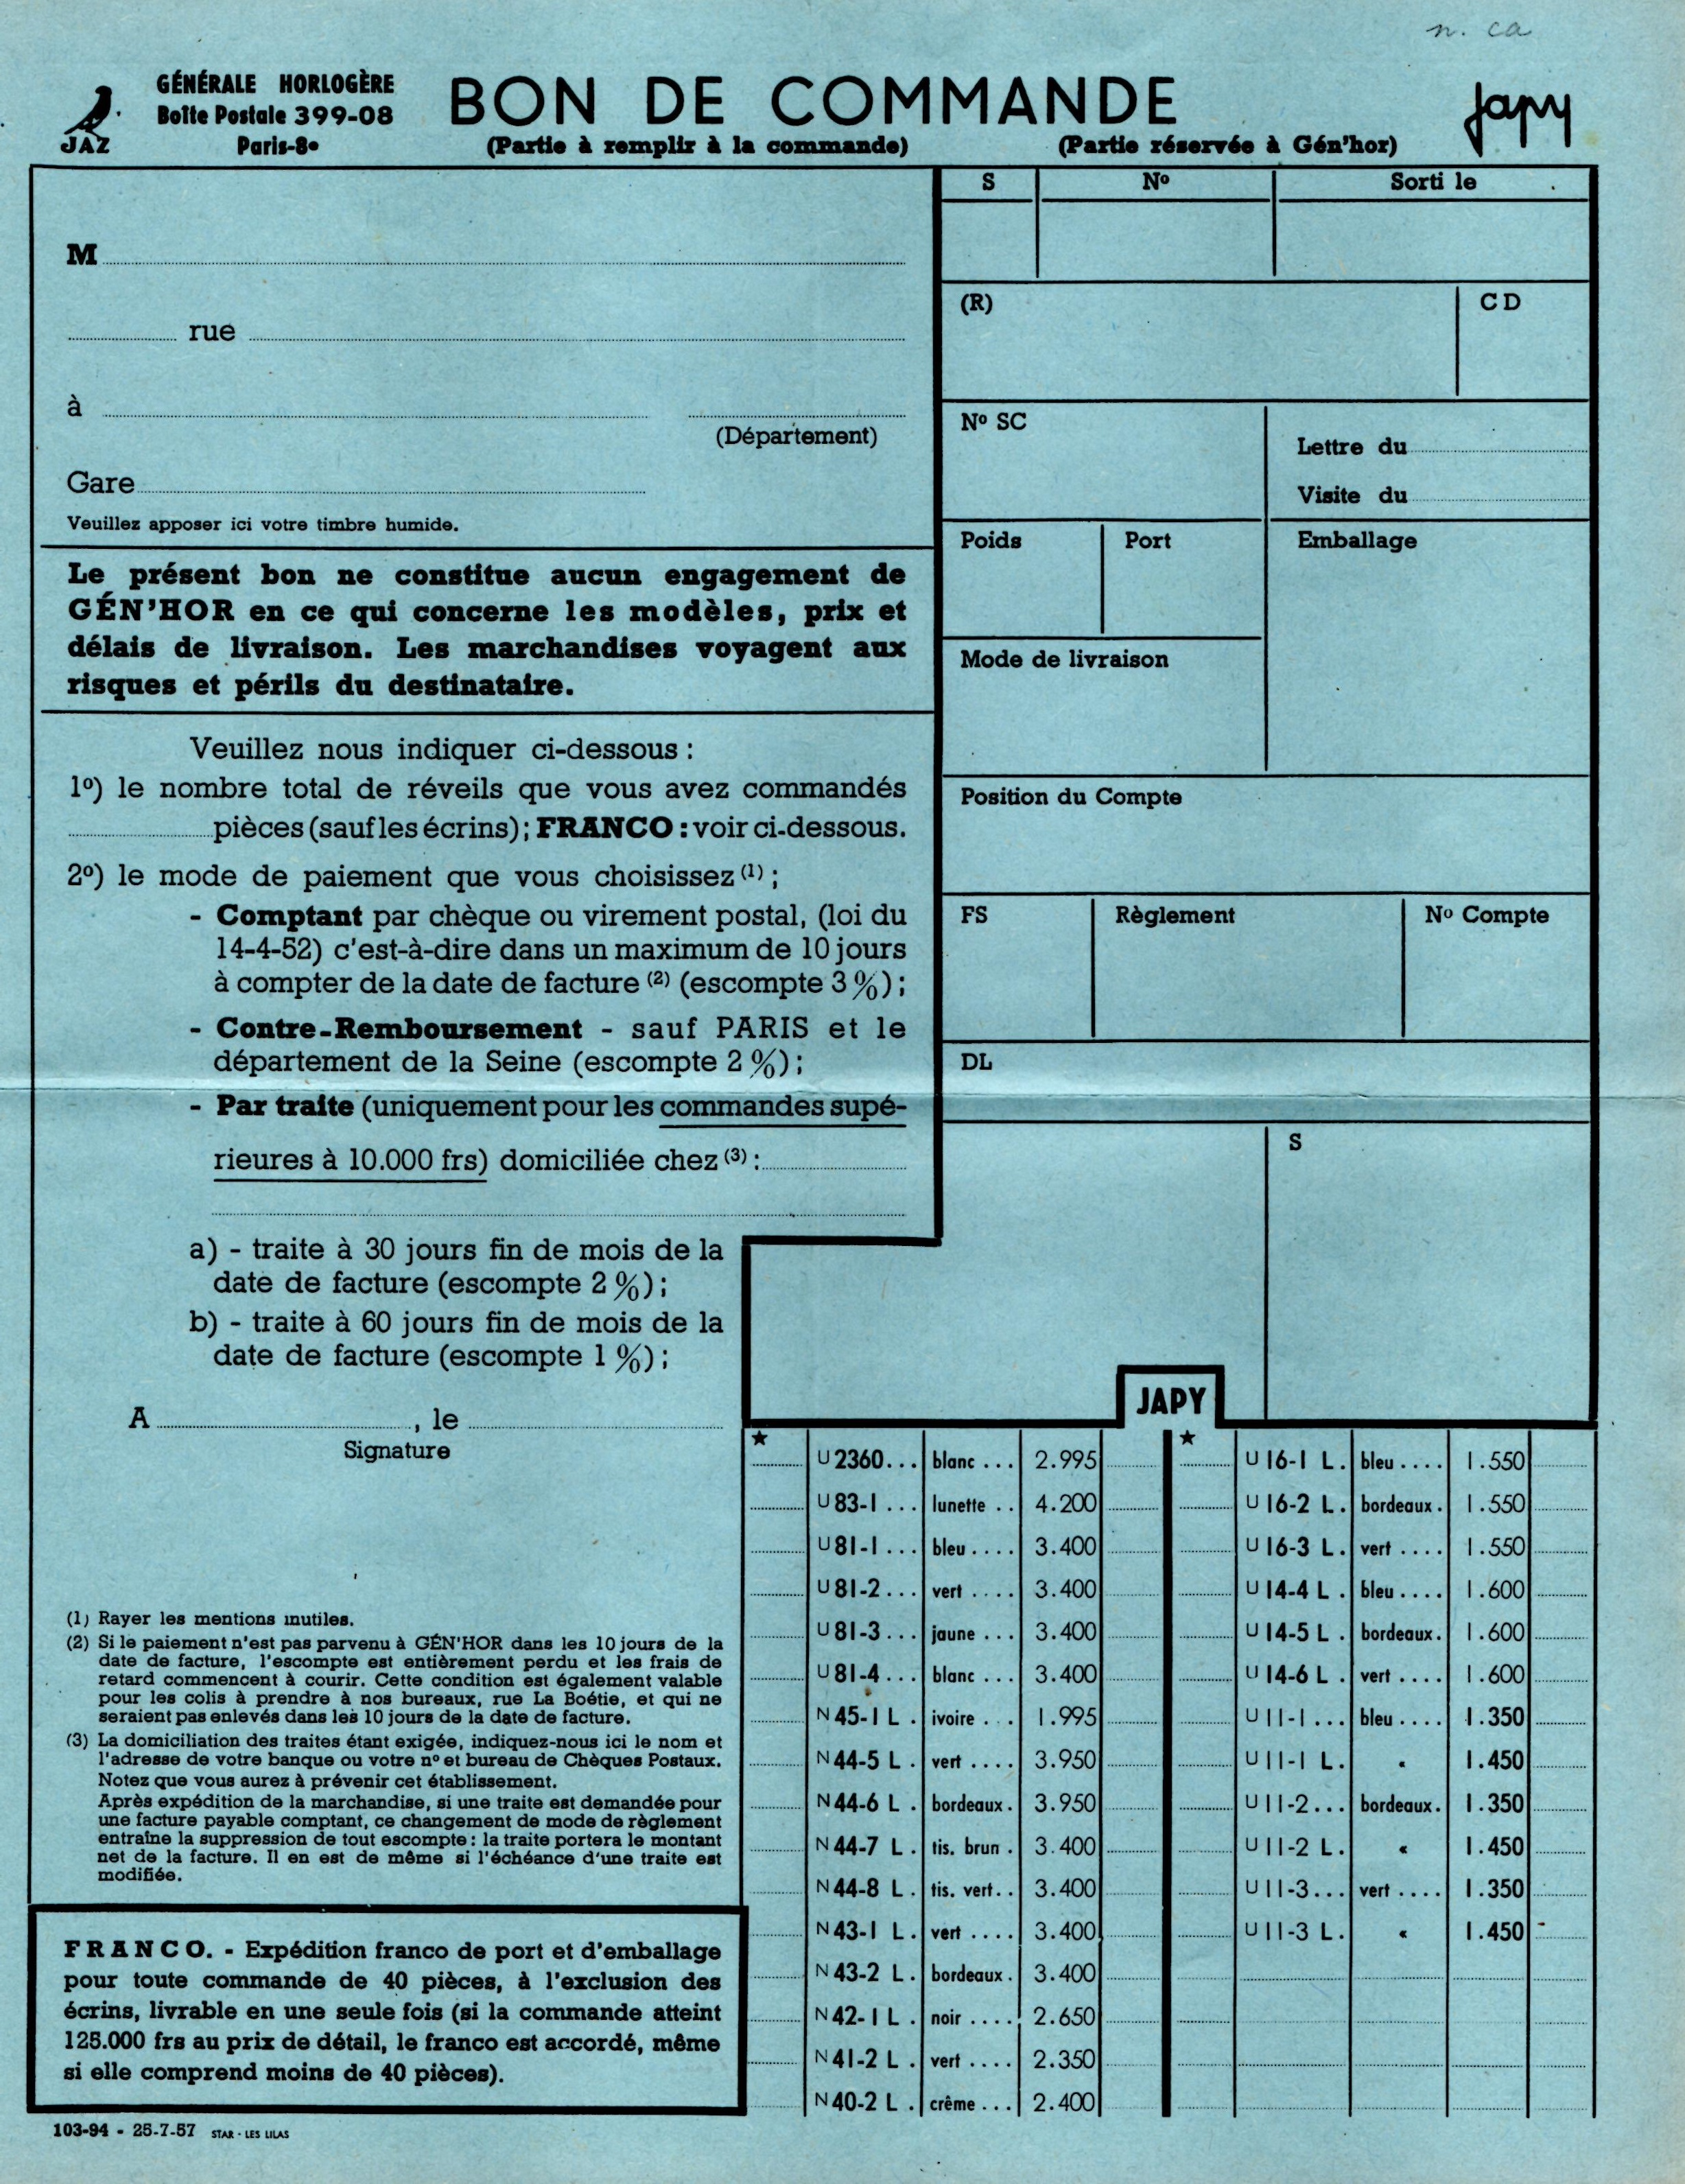 1957 bon de commande tarif FA 57 juillet 1957 page 1